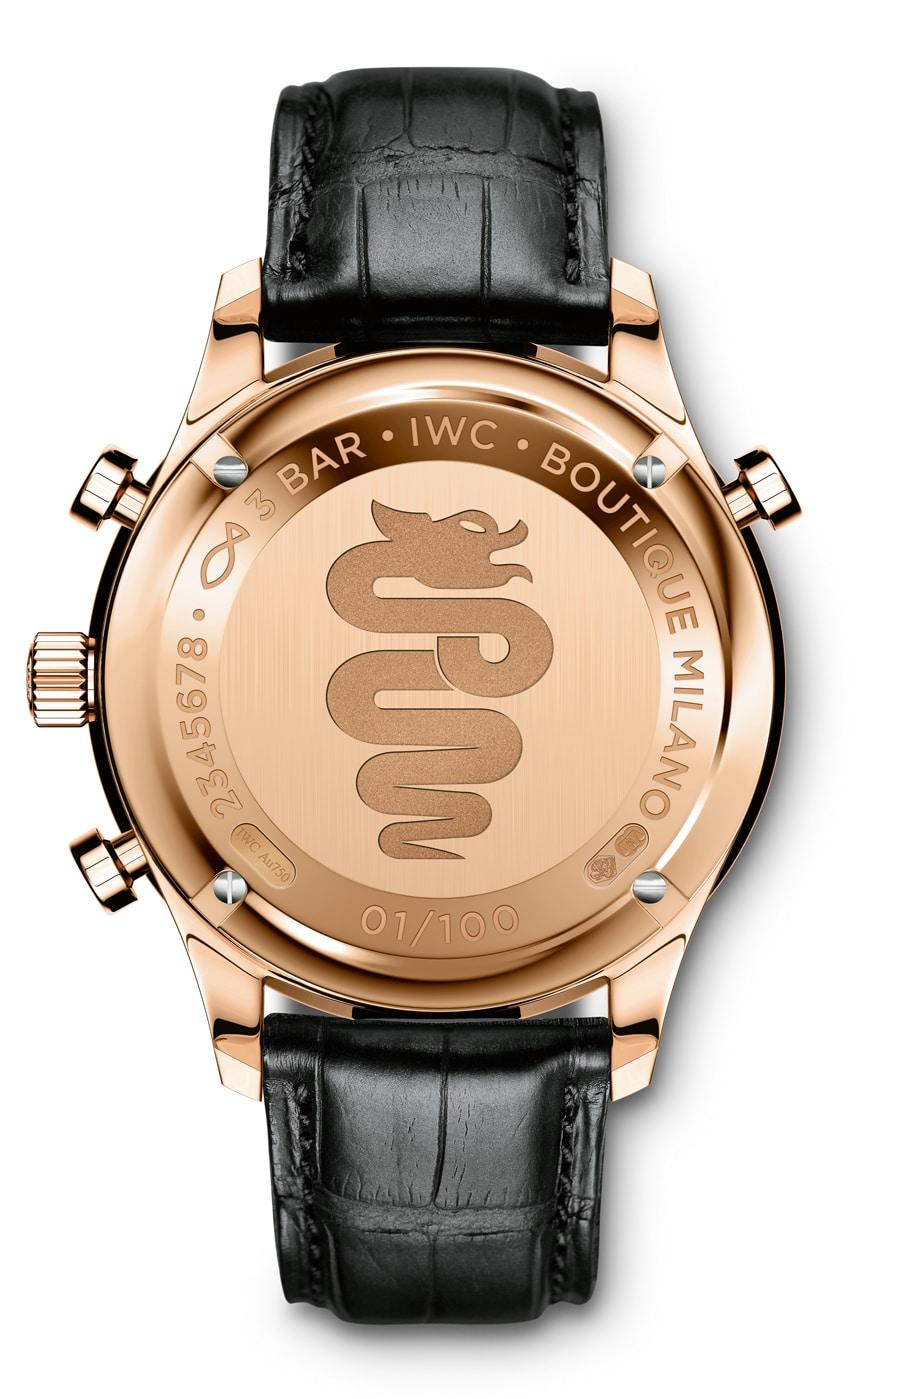 Die IWC Portugieser Chronograph Rattrapante Boutique Milano ziert das Wappen des Herzogtums Mailand